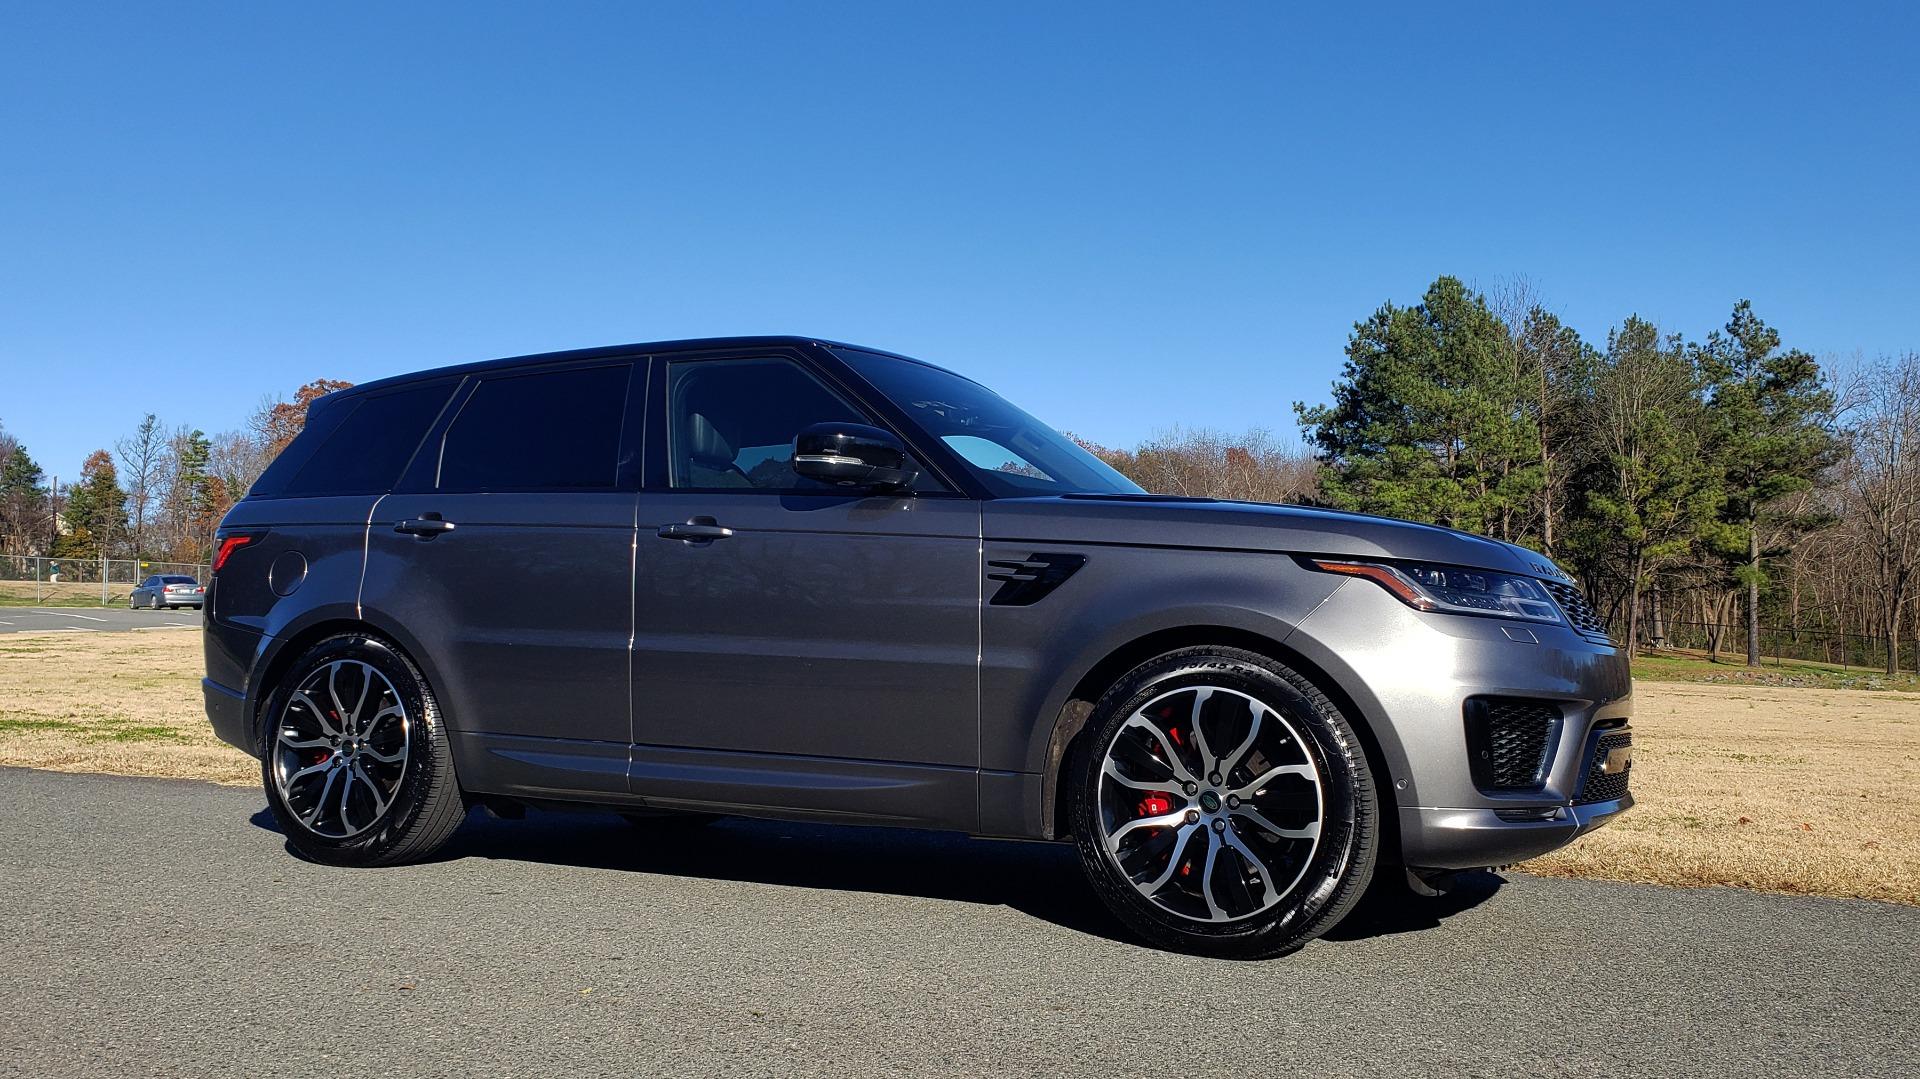 Used 2018 Land Rover RANGE ROVER SPORT DYNAMIC SC V8 / CLIMATE CMFRT / VISION ASST / MERIDIAN for sale Sold at Formula Imports in Charlotte NC 28227 4